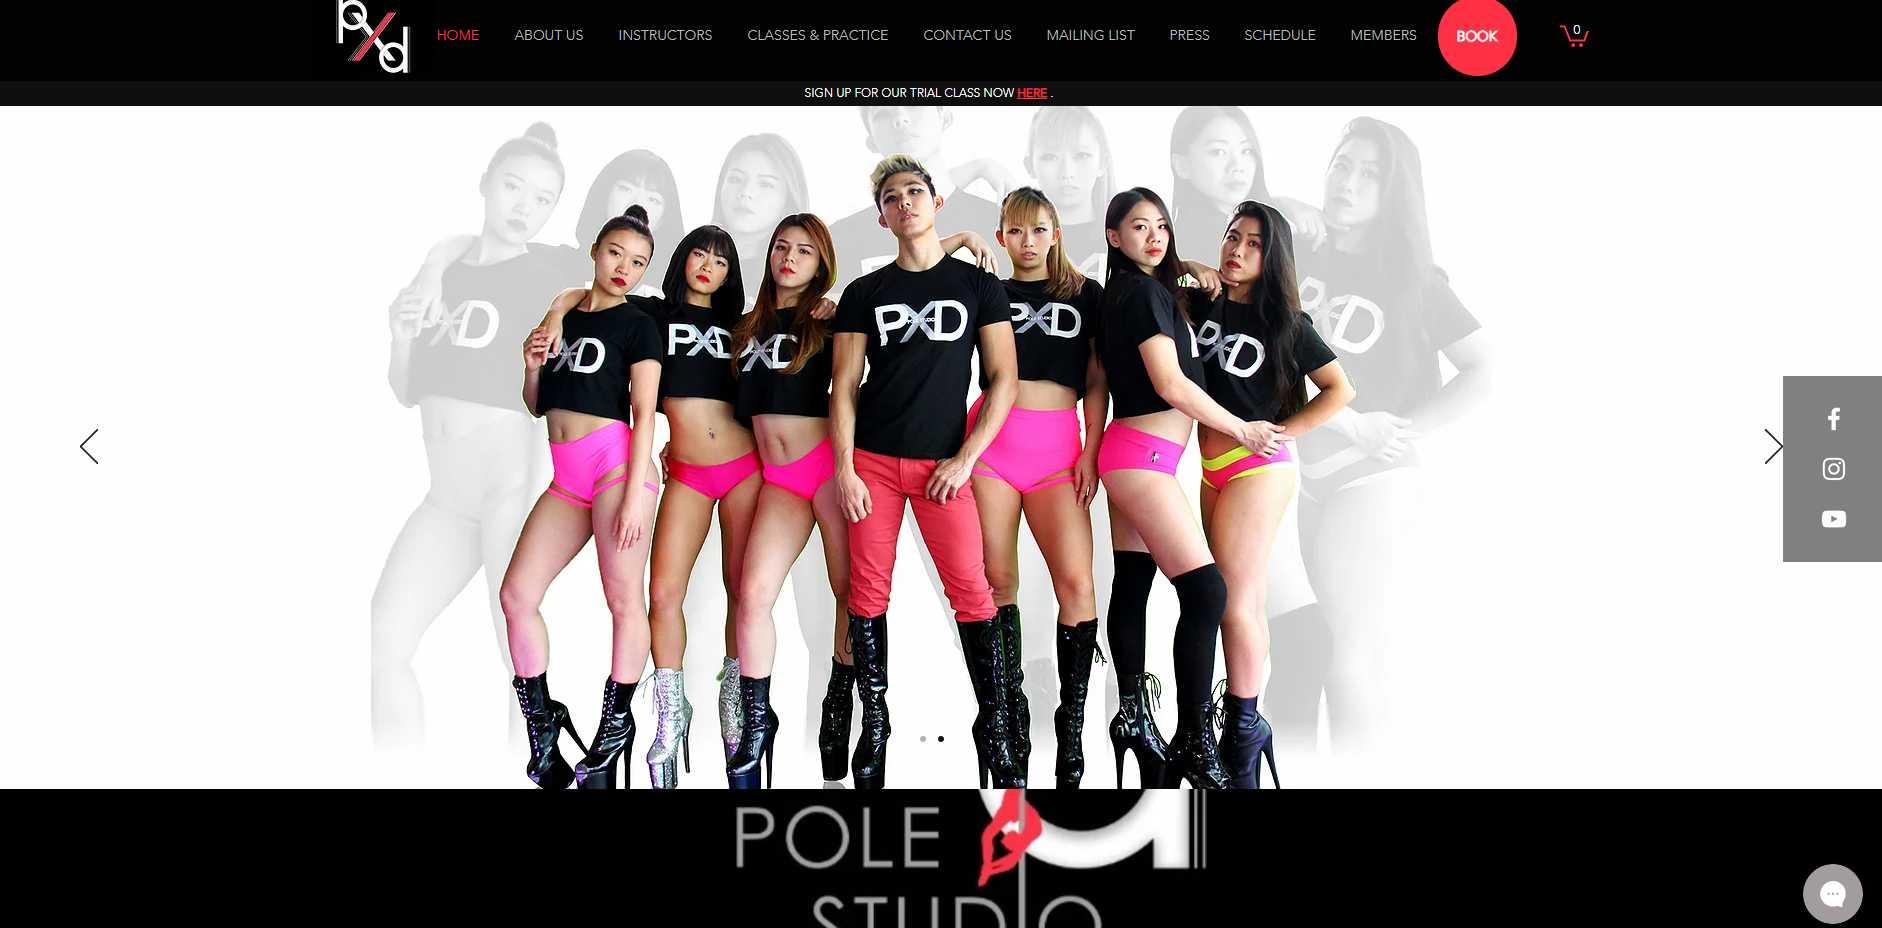 PXD Top Pole Dance Classes in Singapore